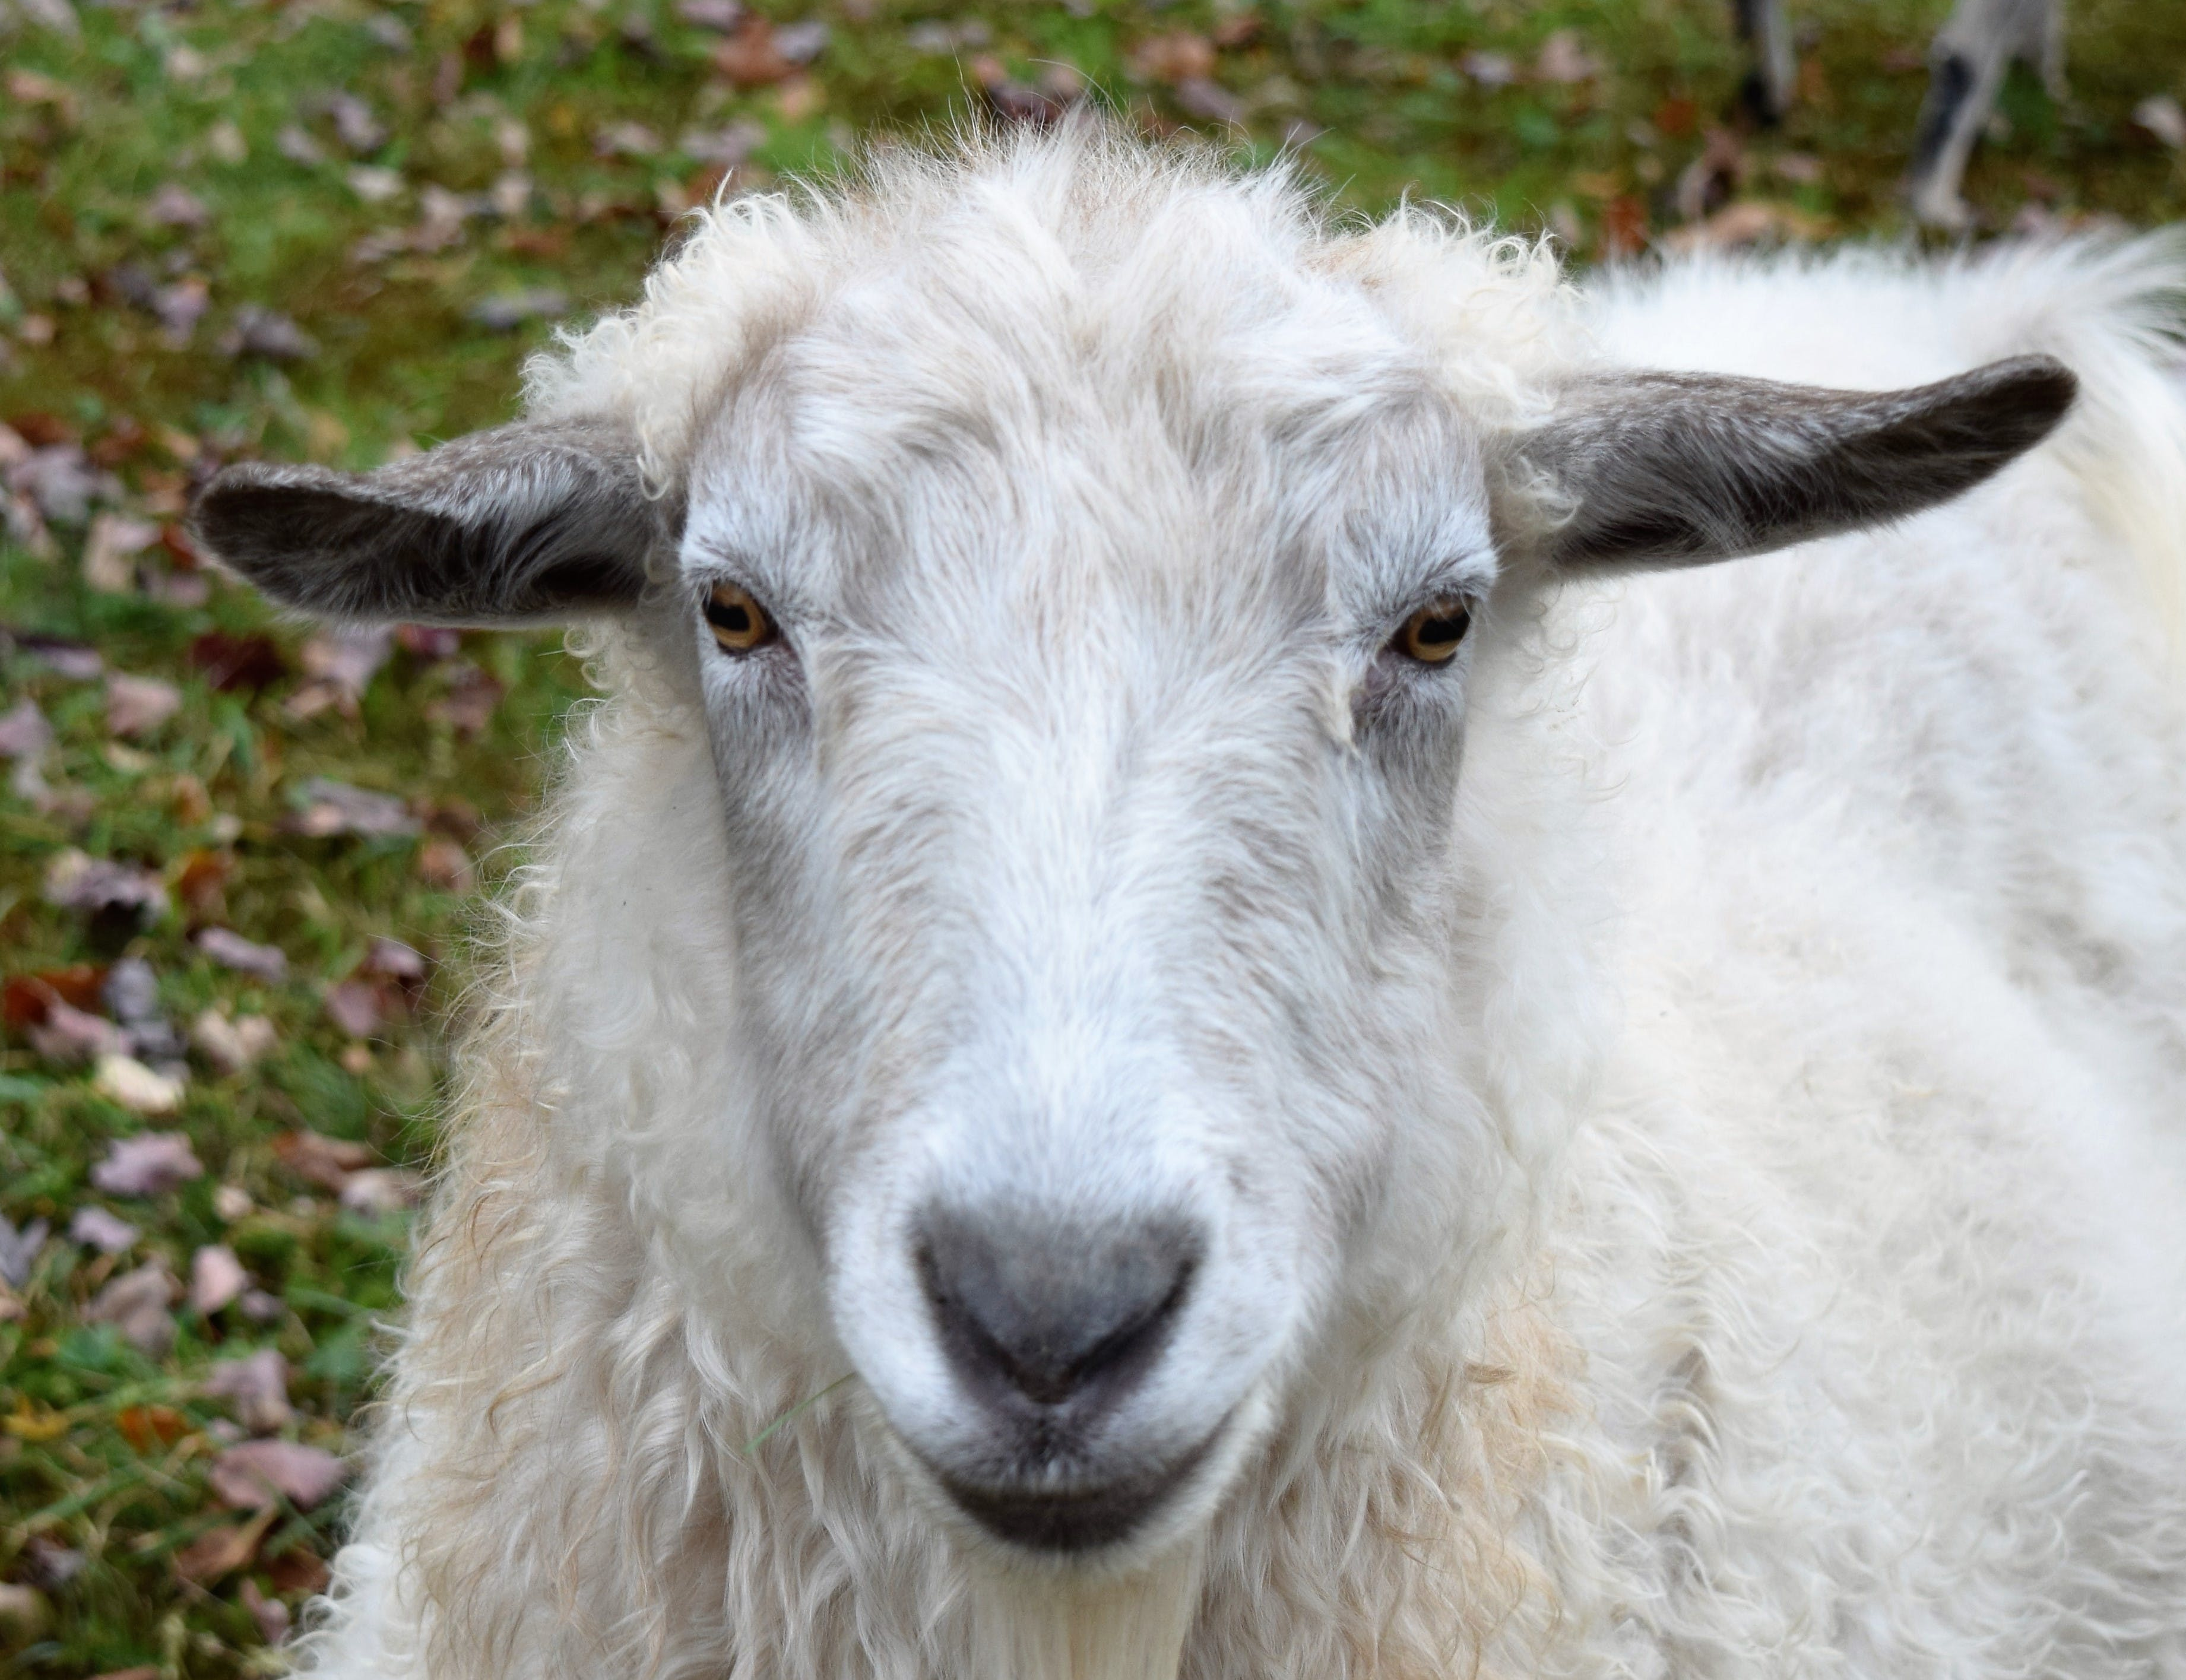 White Sheep on Green Grass